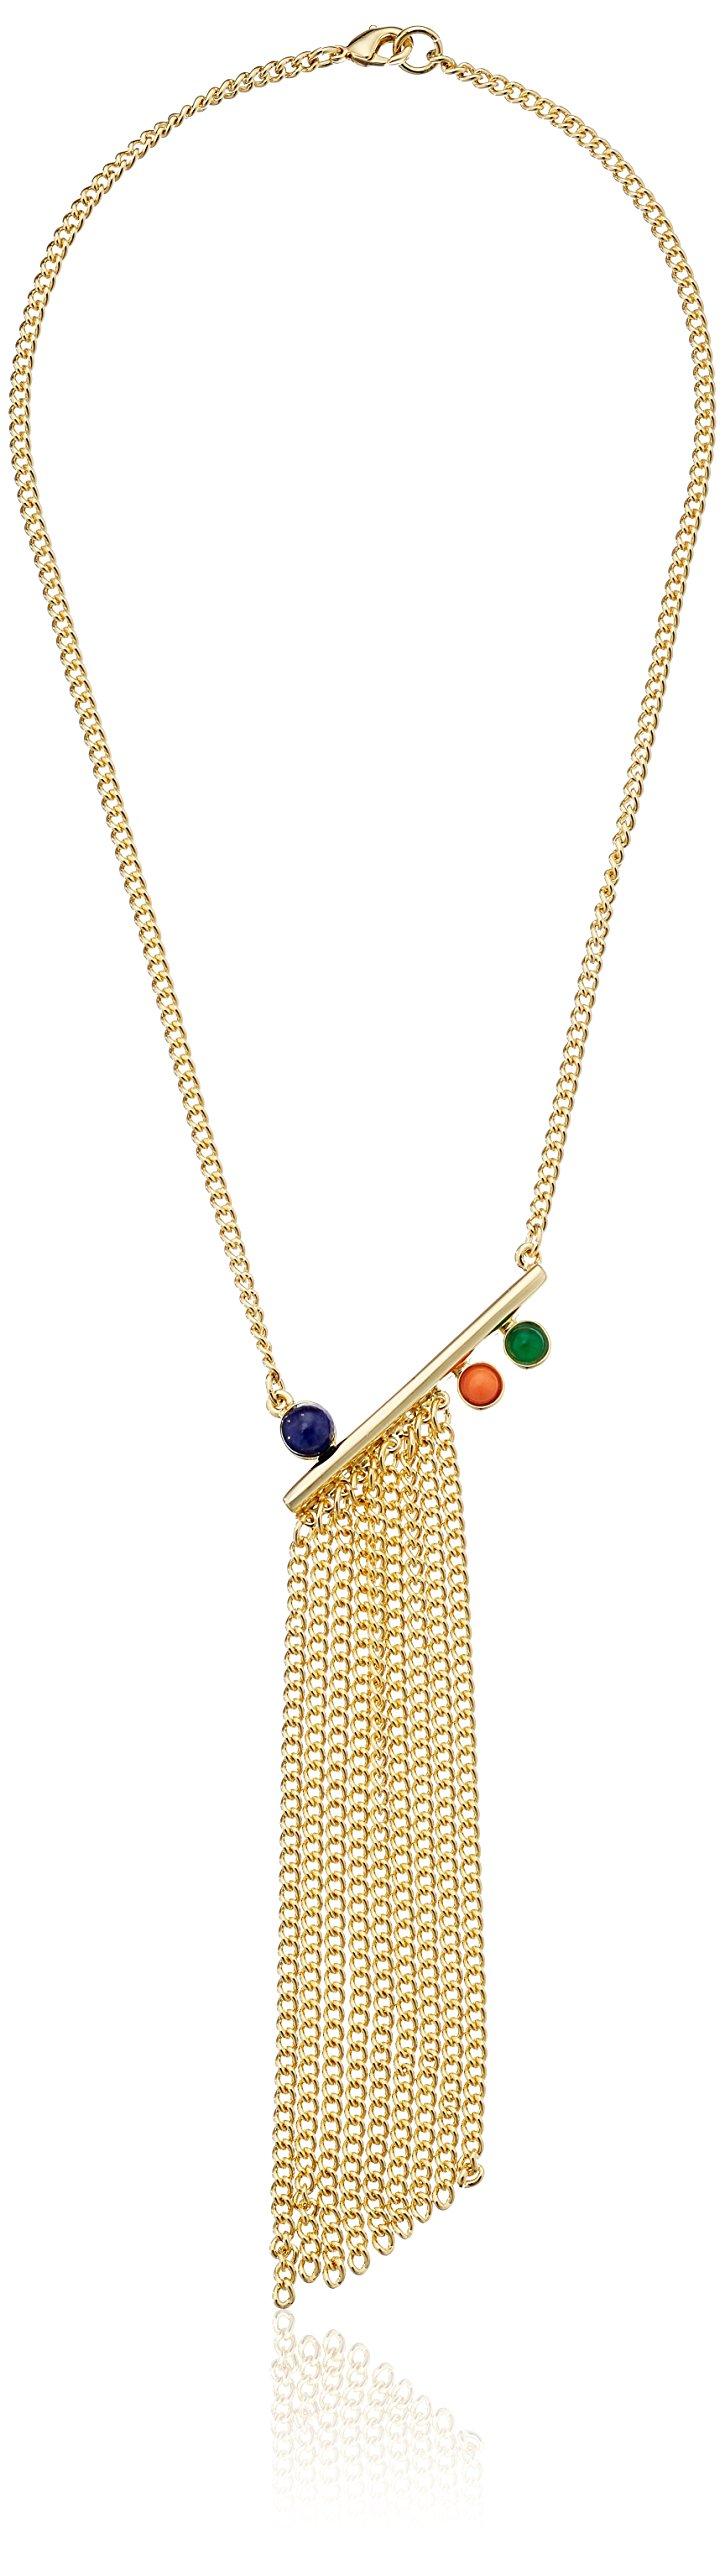 Ben-Amun Jewelry Seville Nights Fringe Y-Shaped Necklace